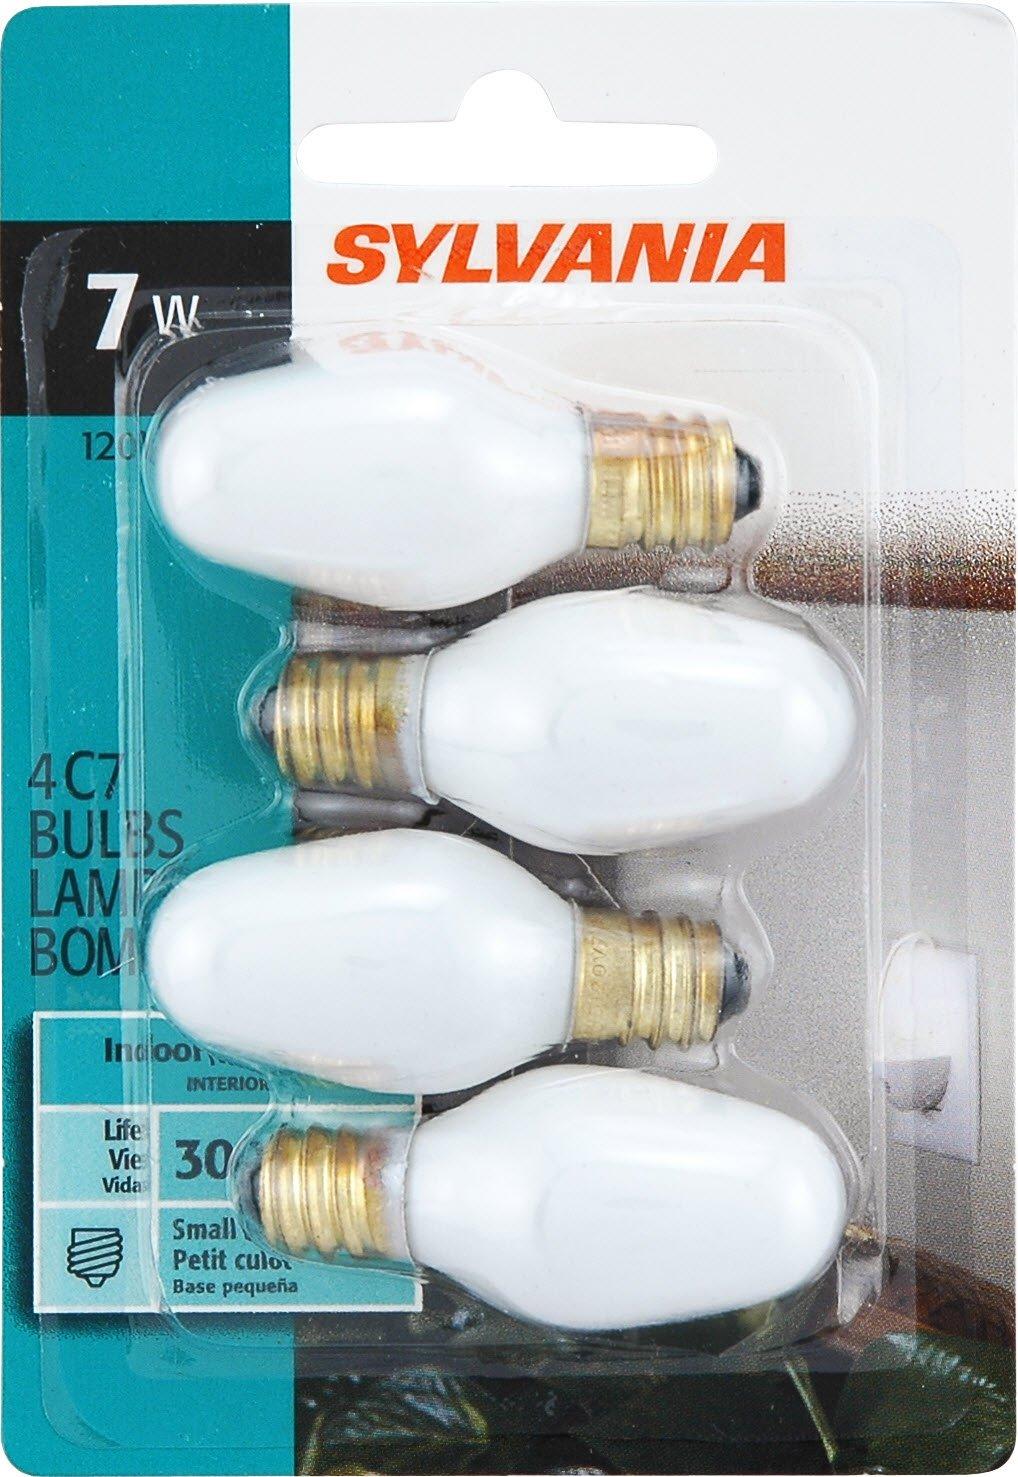 Sylvania Home Lighting 13544 Incandescent Light Bulb C7-7W, White Finish, Candelabra Base, 4 Pack by Sylvania Home Lighting